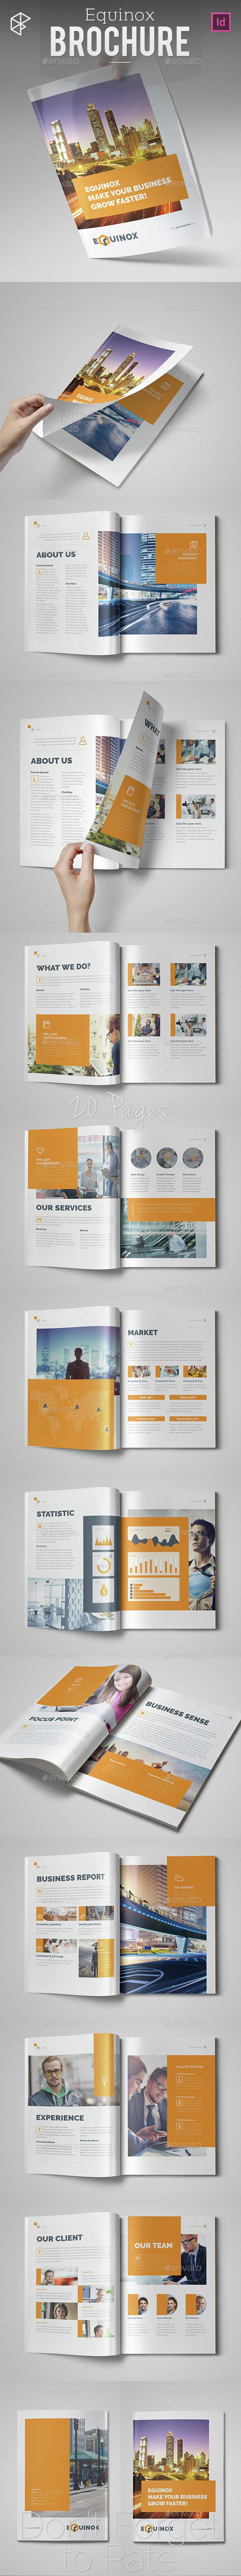 Equinox Brochure | Catálogo